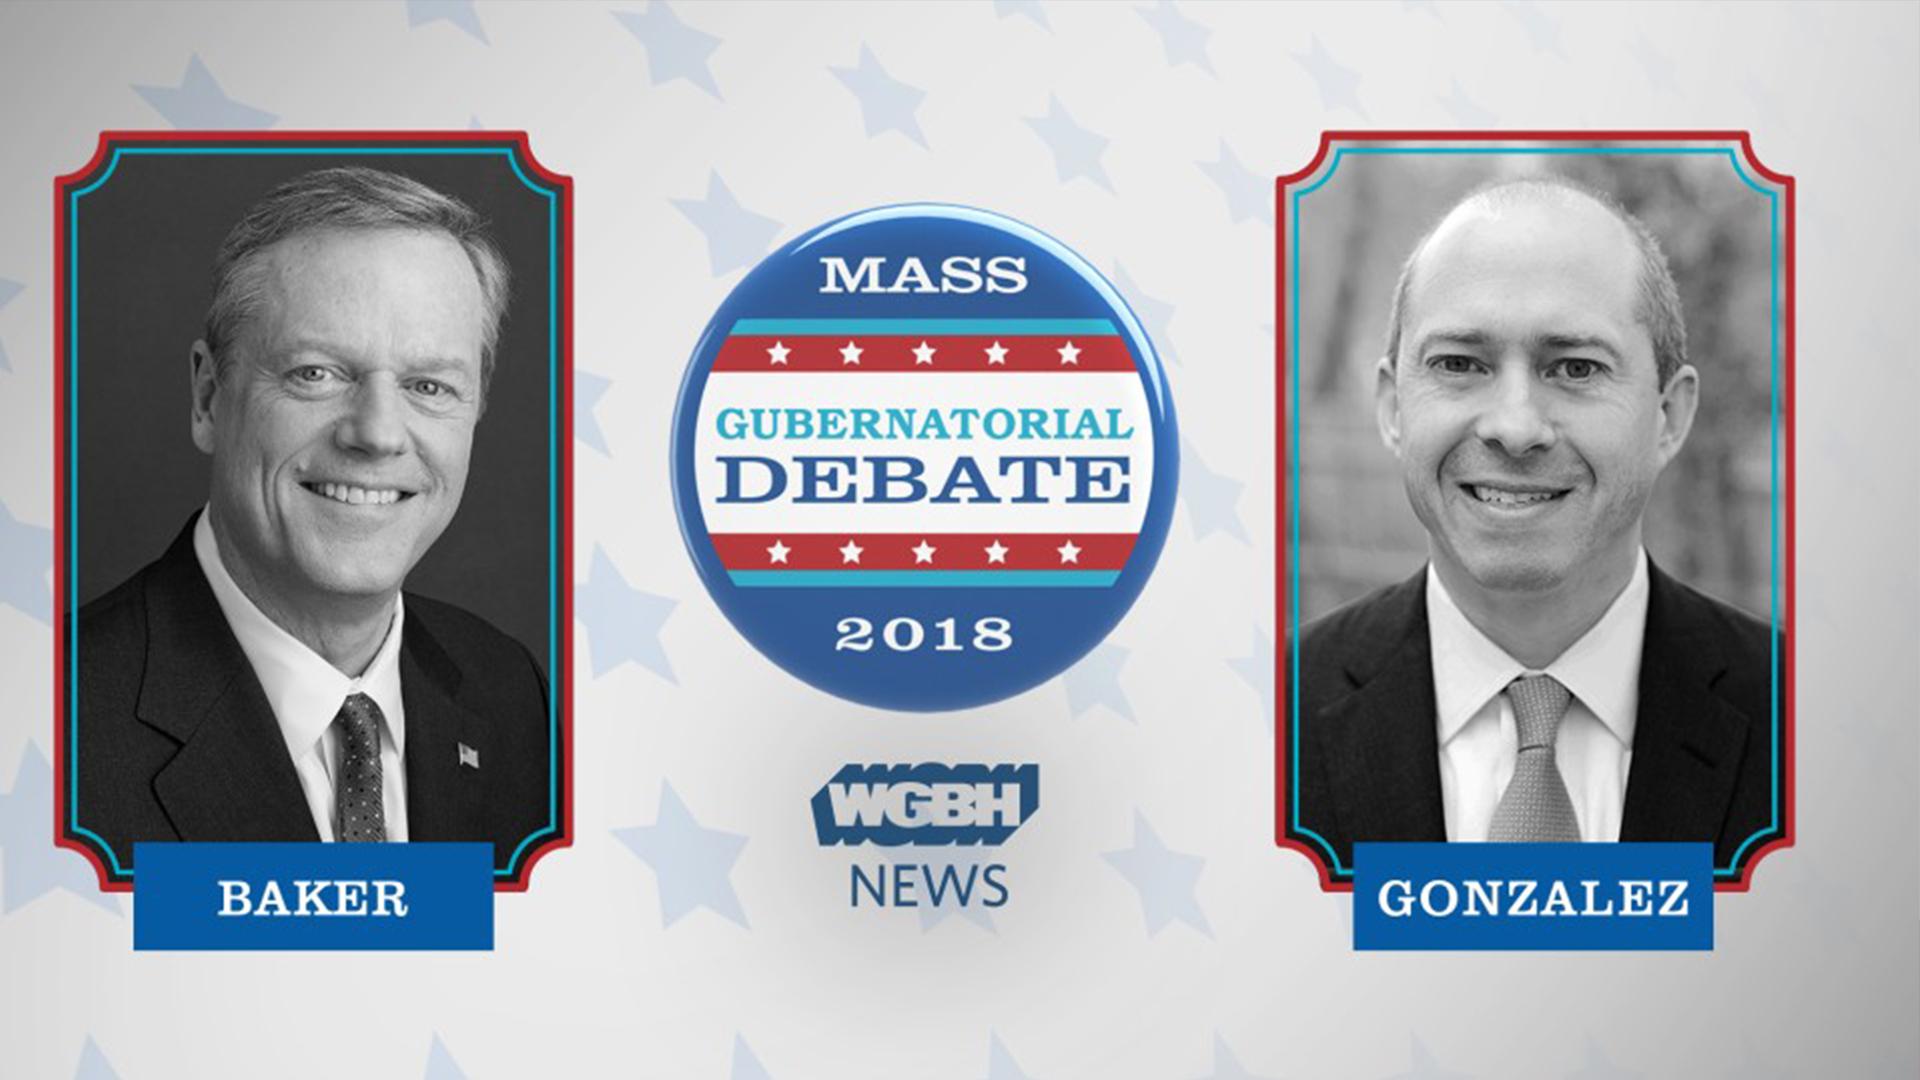 2018 Massachusetts Gubernatorial Debate with Charlie Baker and Jay Gonzalez